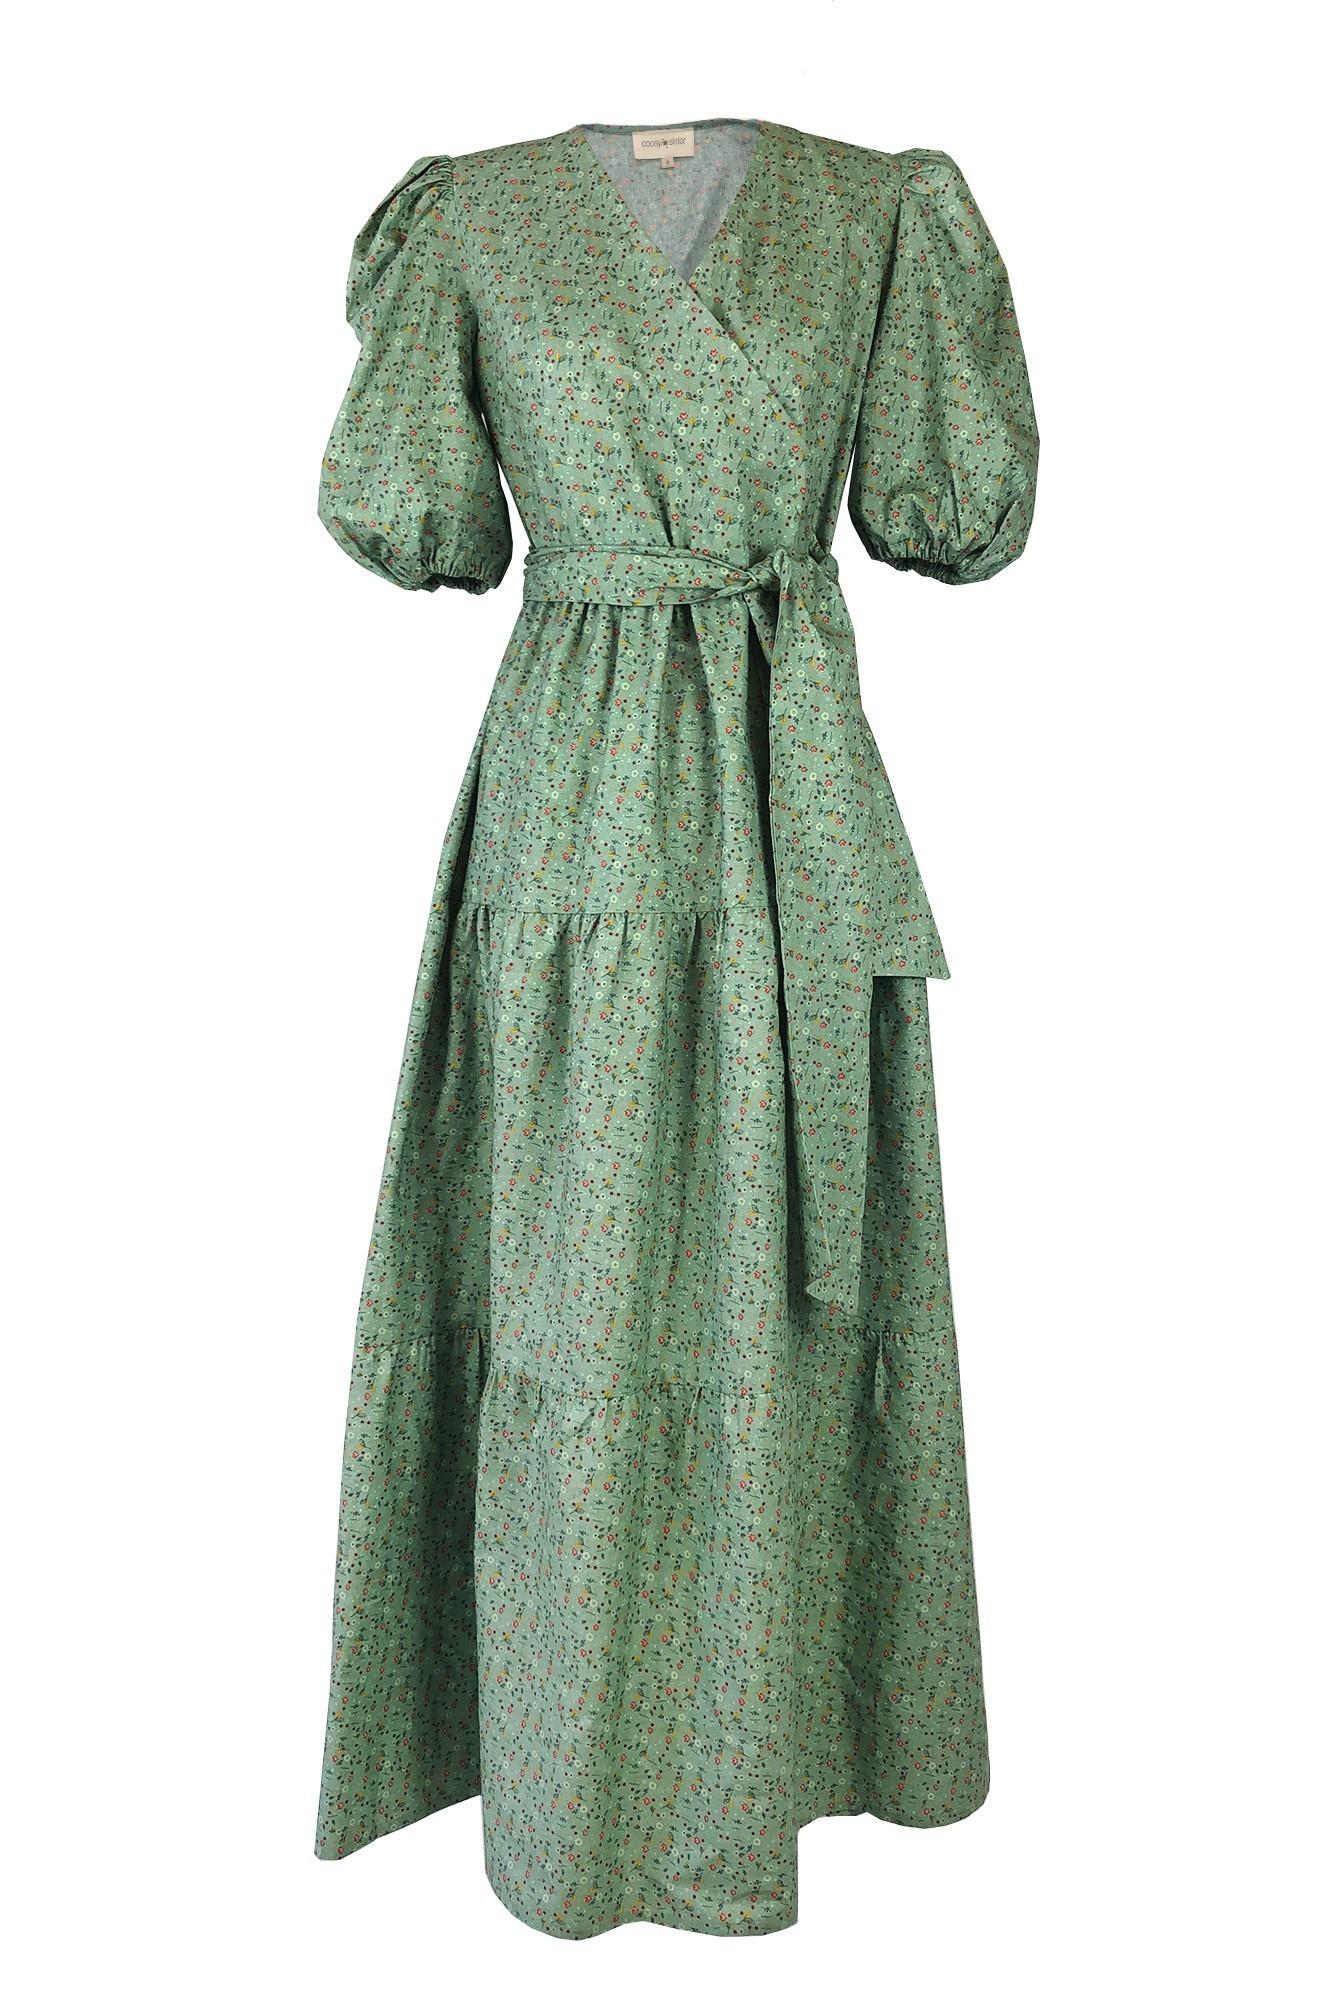 SISTER FADI GREEN DRESS